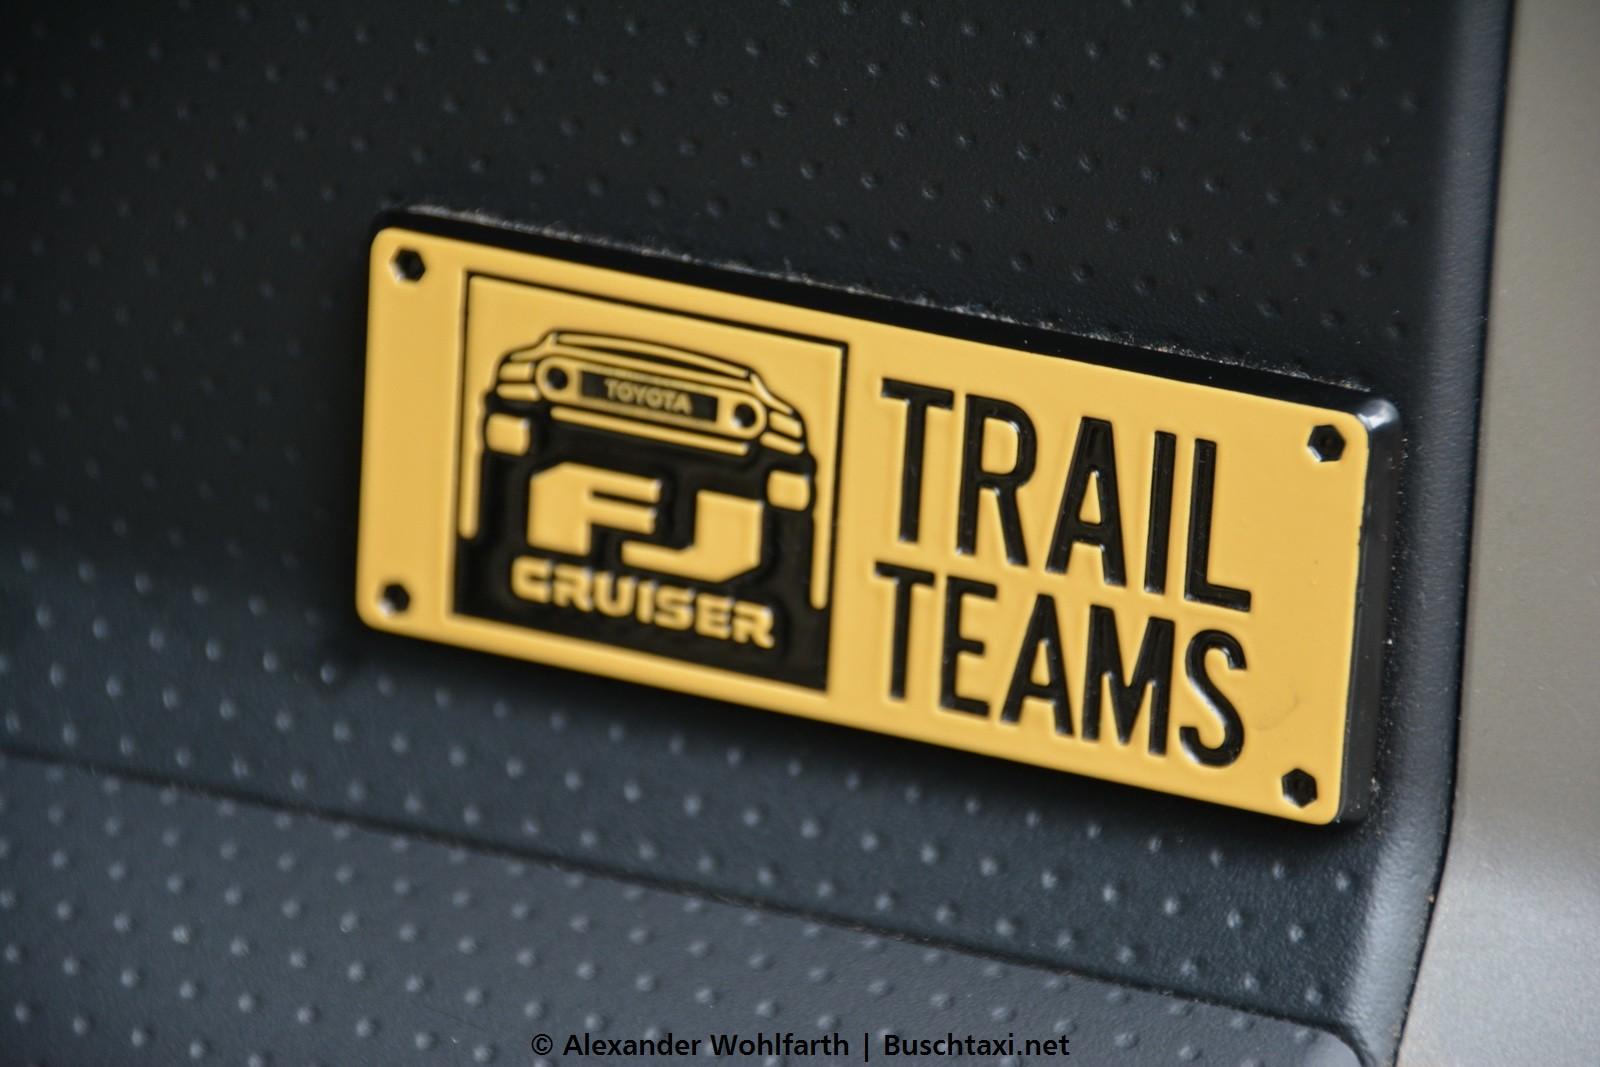 2016-05-01 fj cruiser trail teams nestle 02